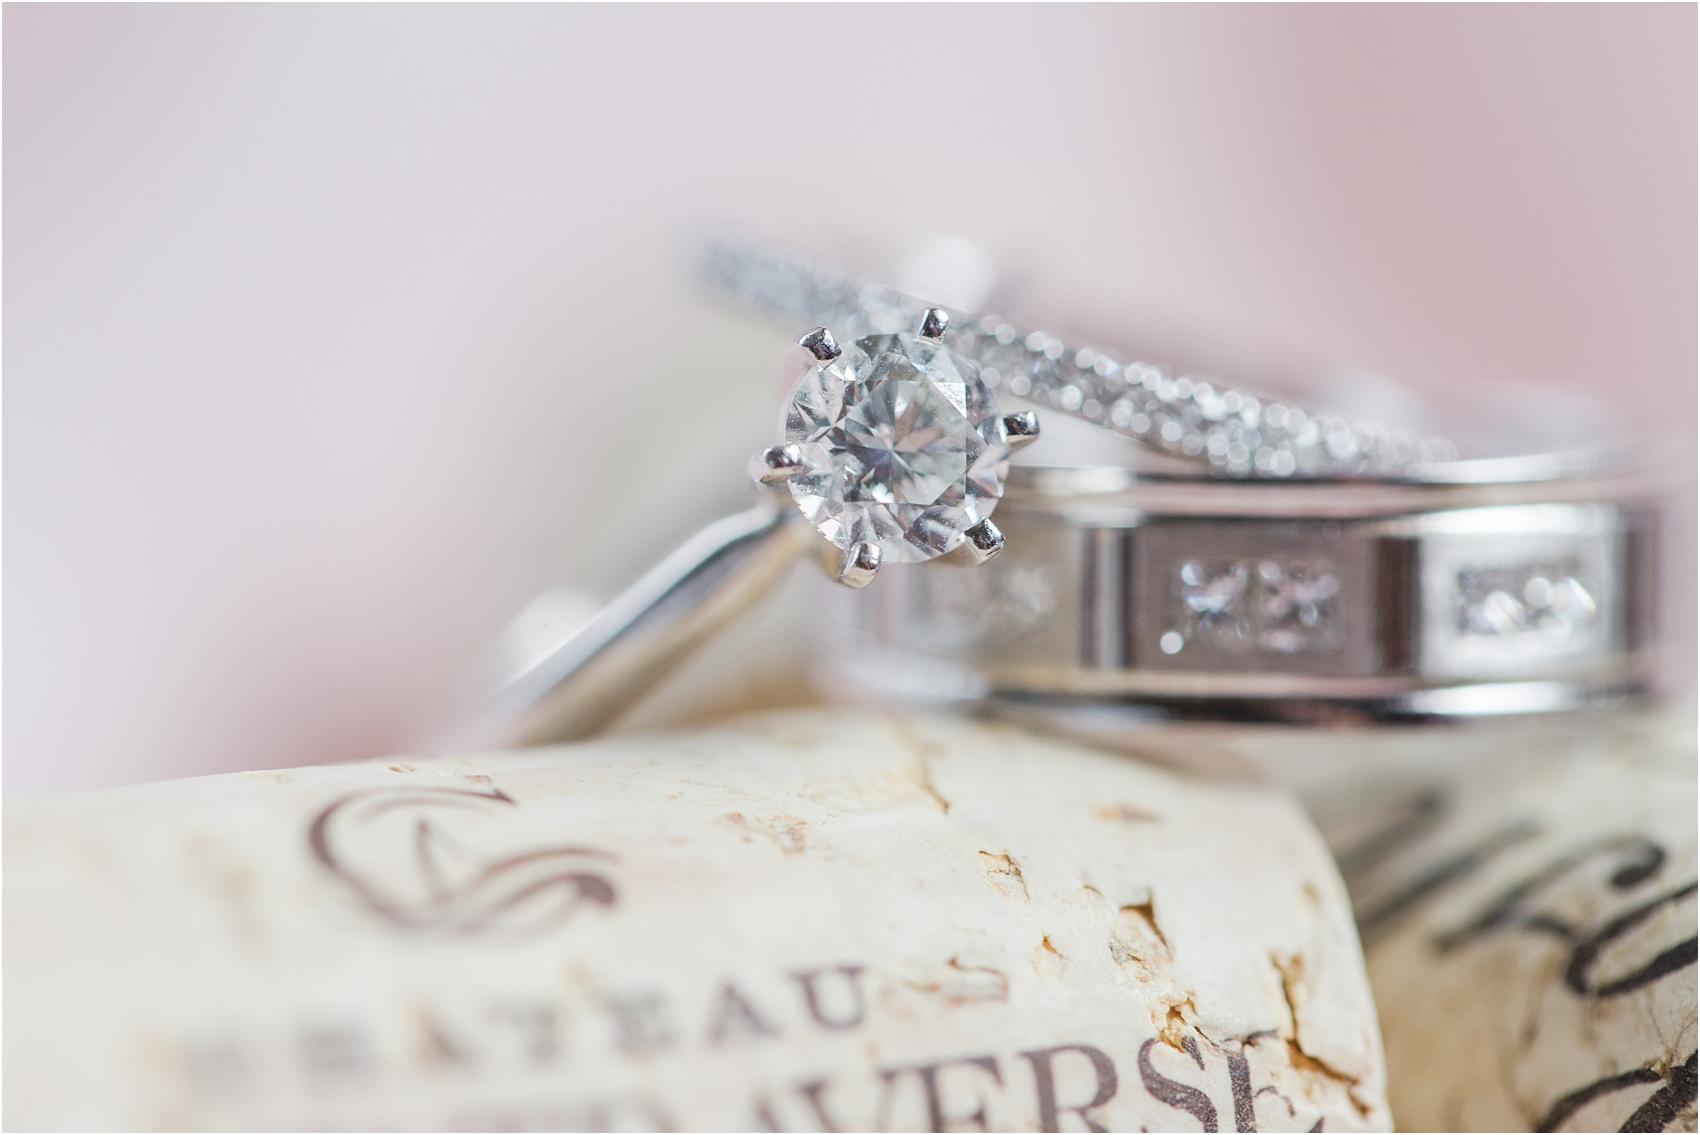 joyful-and-candid-navy-blush-wedding-photos-at-crystal-gardens-in-howell-mi-by-courtney-carolyn-photography_0015.jpg